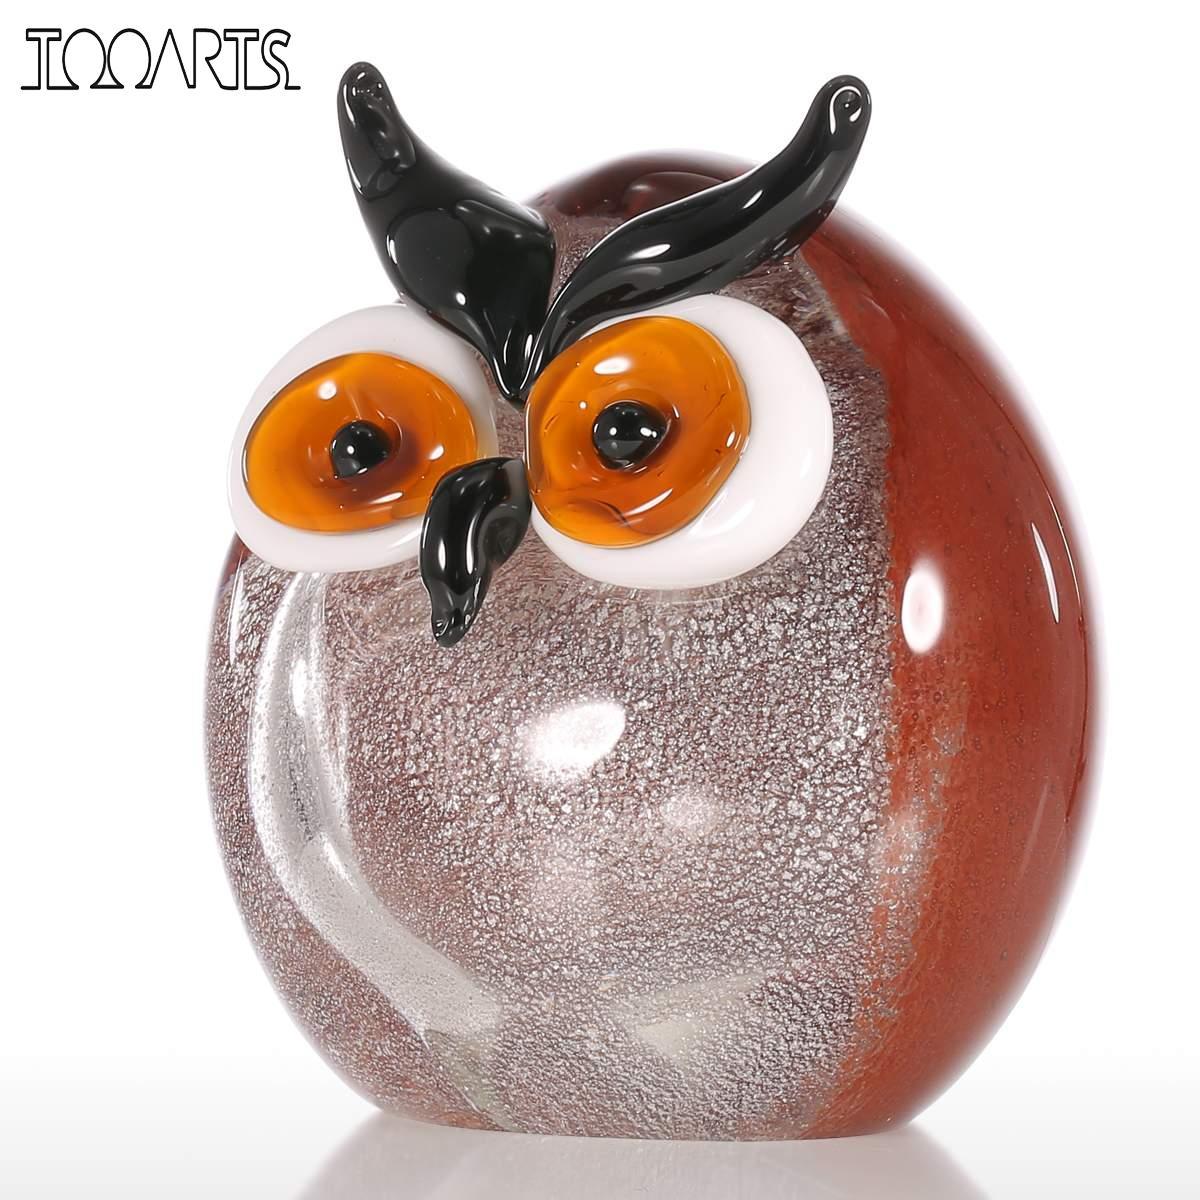 Tooarts Chubby Owl Figurine Glass Ornament Animal Statuettes Home Decoration Accessories Modern Handblown Home Decor Multicolor